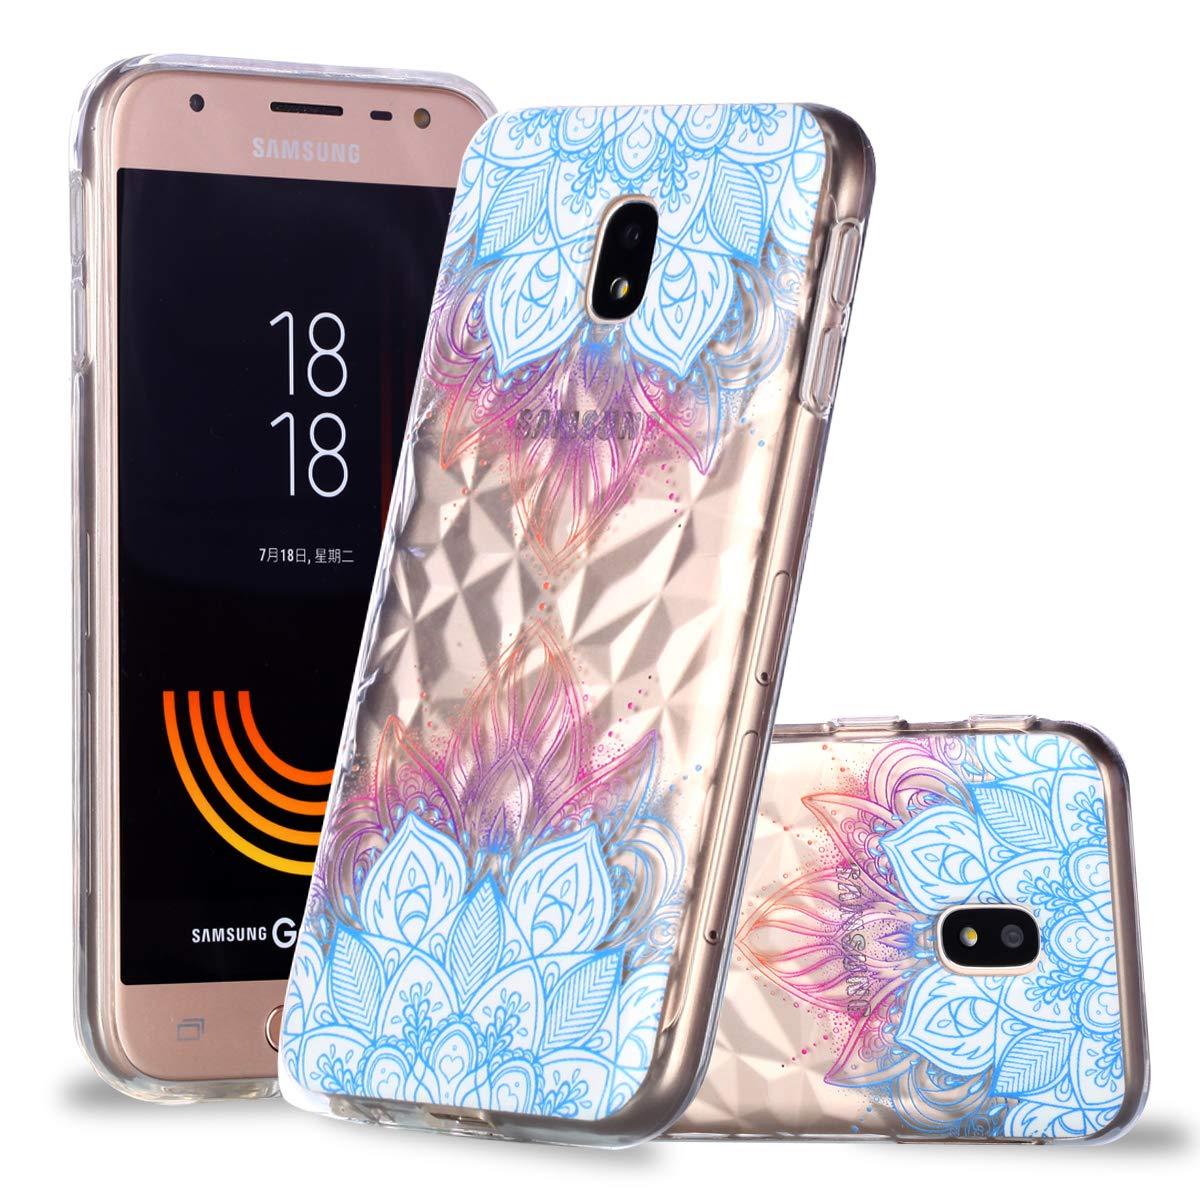 Galaxy J730 Coque Transparente Souple,Samsung Galaxy J730 Case Bumper Transparent en Silicone Ultra Slim Mince en Caoutchouc Coque (5) Wkloer